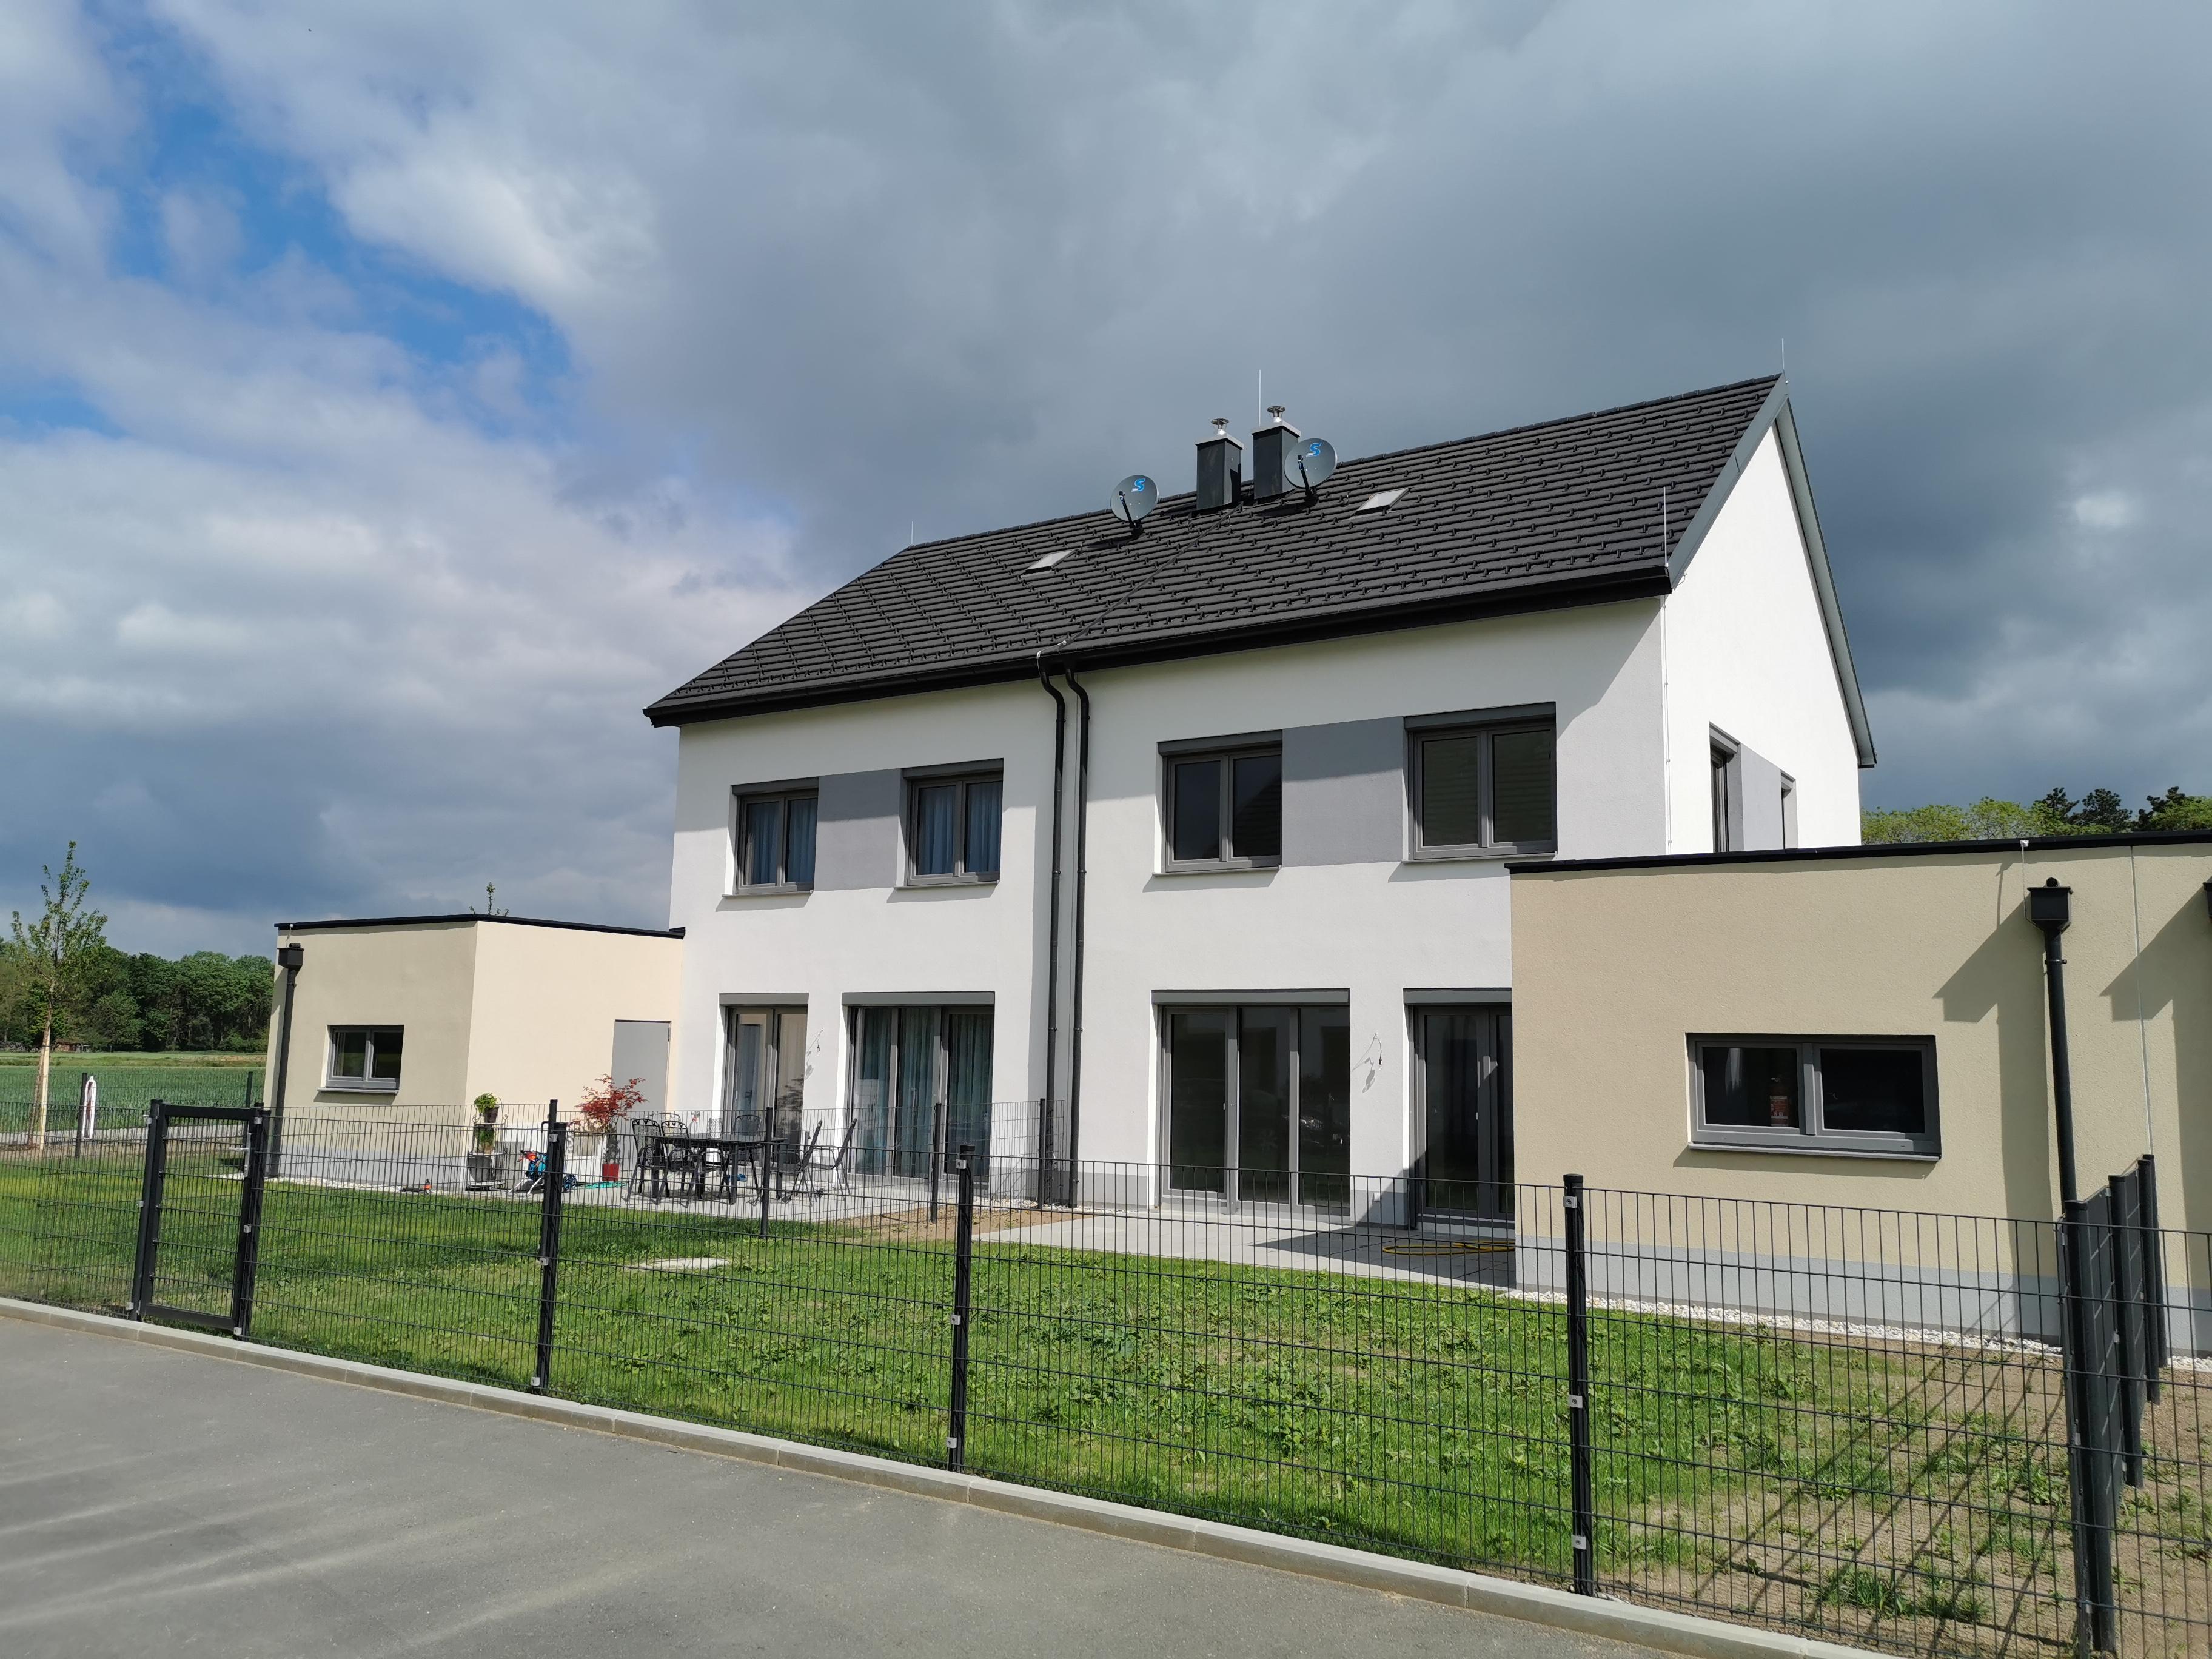 Immobilie von Kamptal in 2136 Laa an der Thaya, Mistelbach, Laa/Thaya XVIII - Top 7 #5